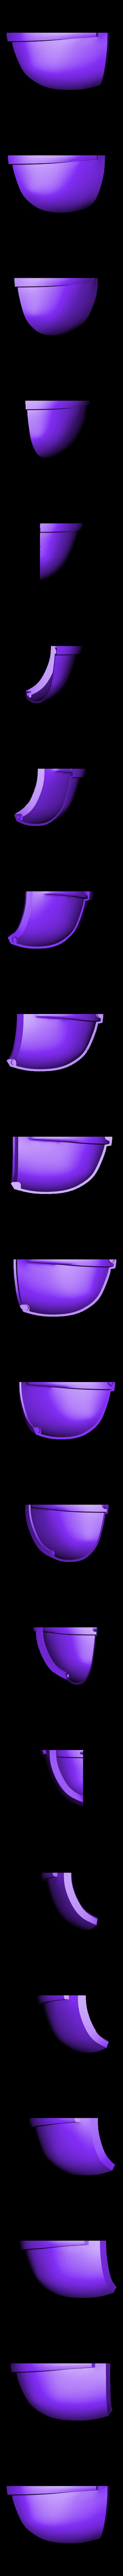 Part_16_v4.stl Download free STL file  Blood Dragon Helmet Mass Effect 2 (With Back Access) • 3D printable template, VillainousPropShop